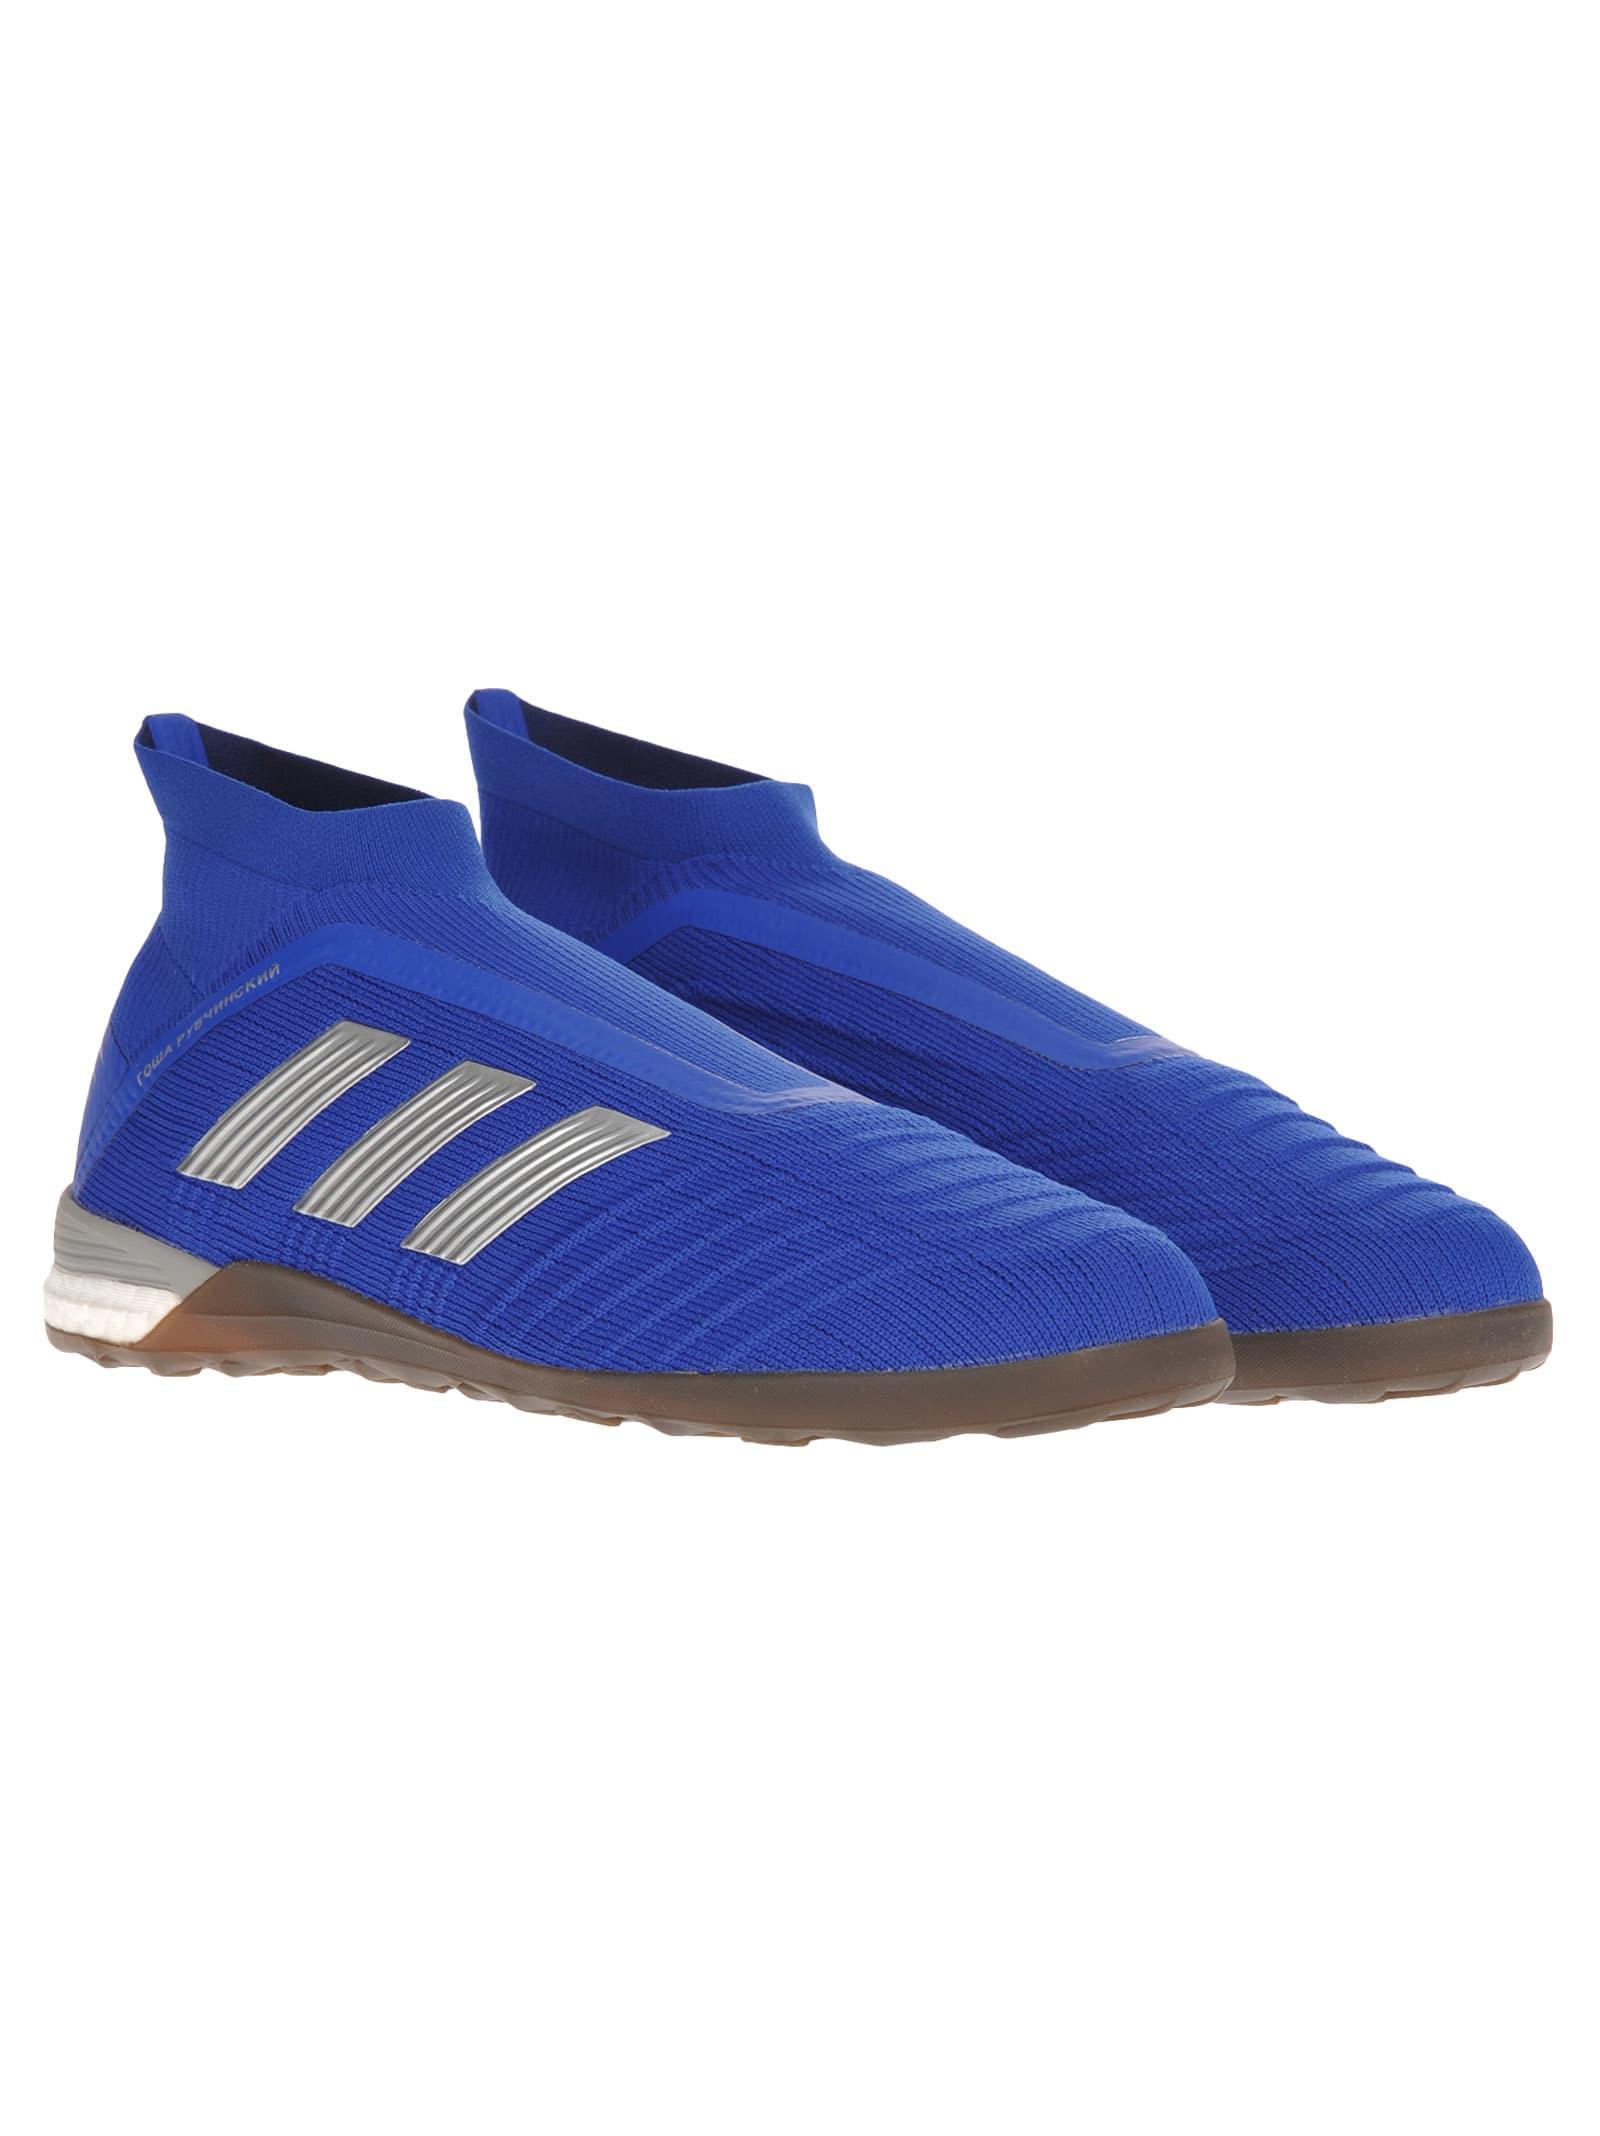 check out b2557 bc9ca Gosha Rubchinskiy Gosha Rubchinskiy - Sneakers 'predator'